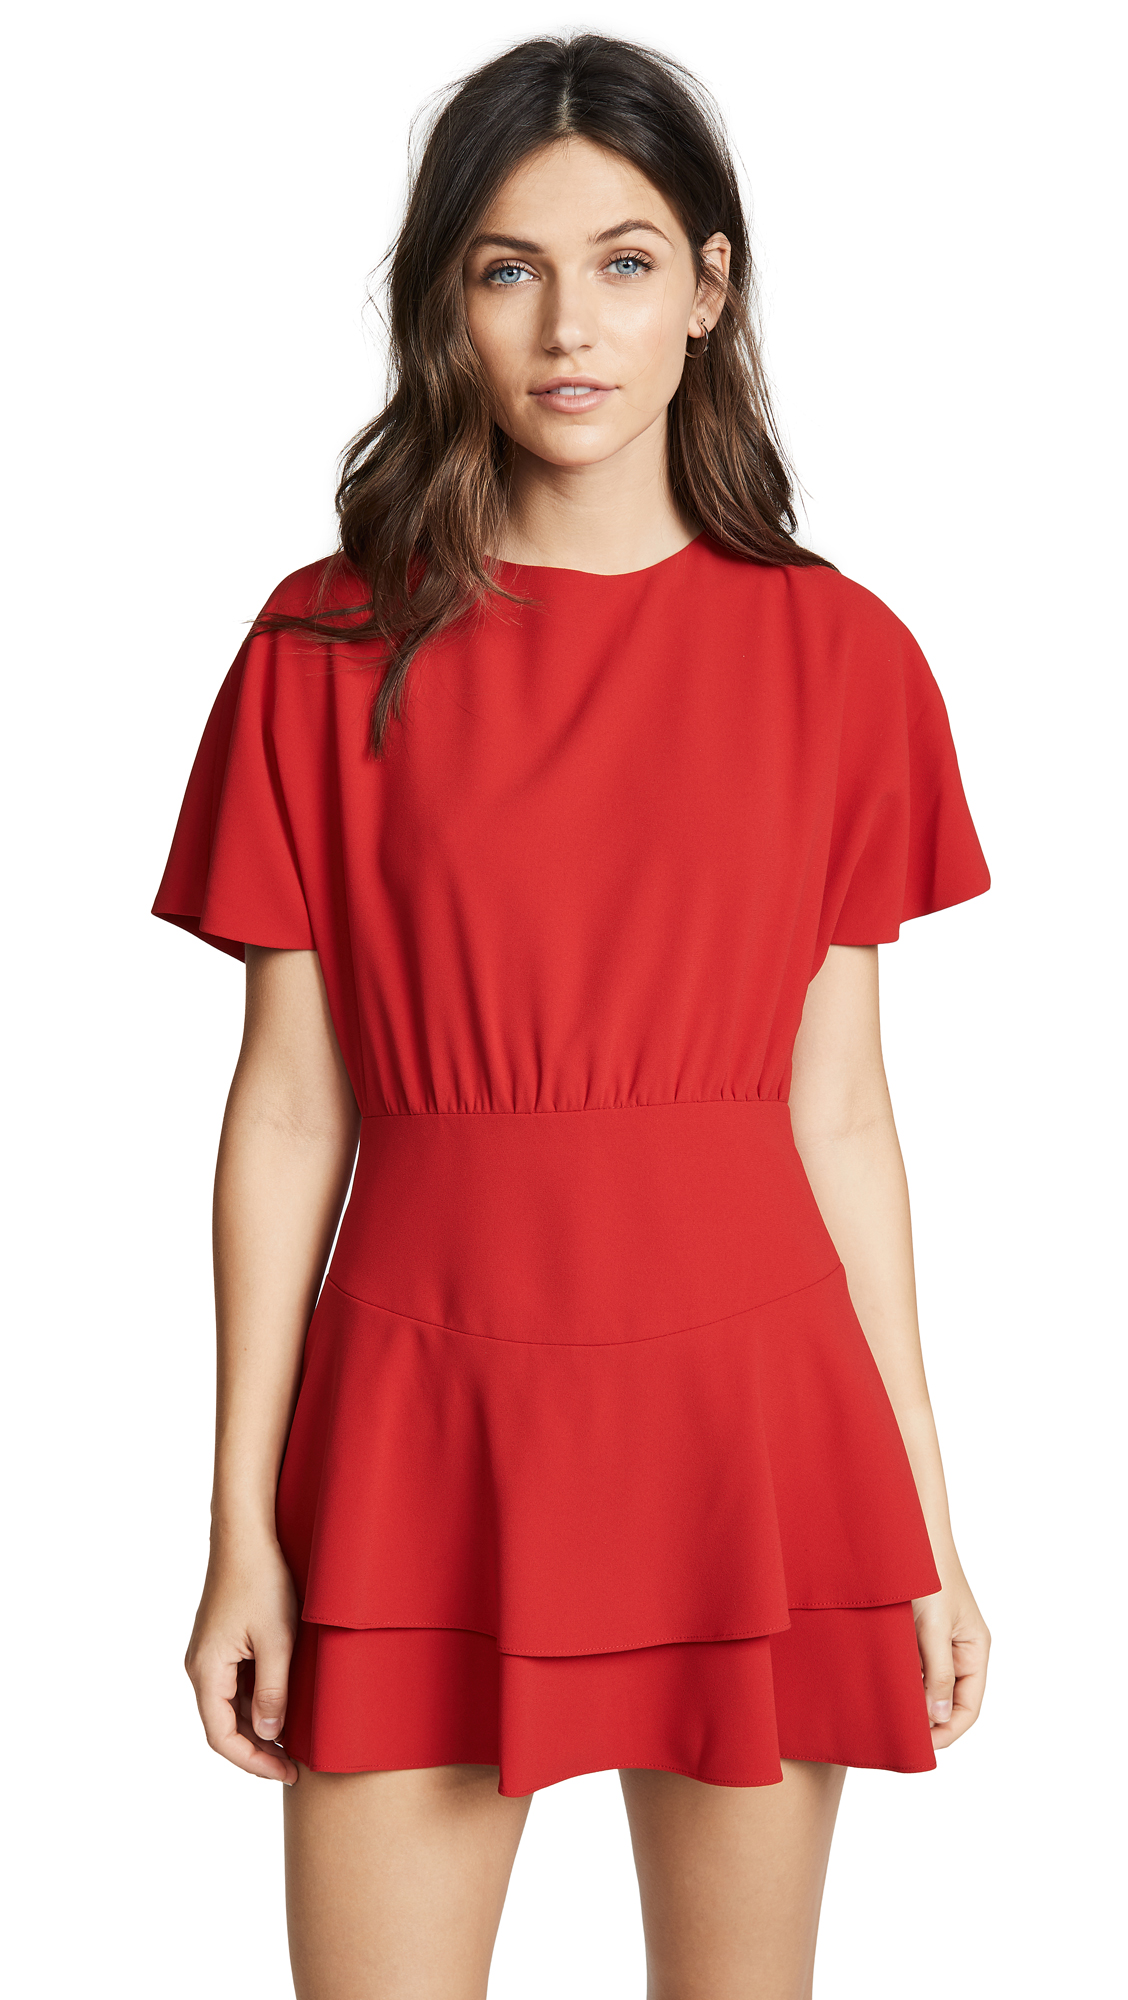 alice + olivia Palmira Tiered Ruffle Dress In Ruby